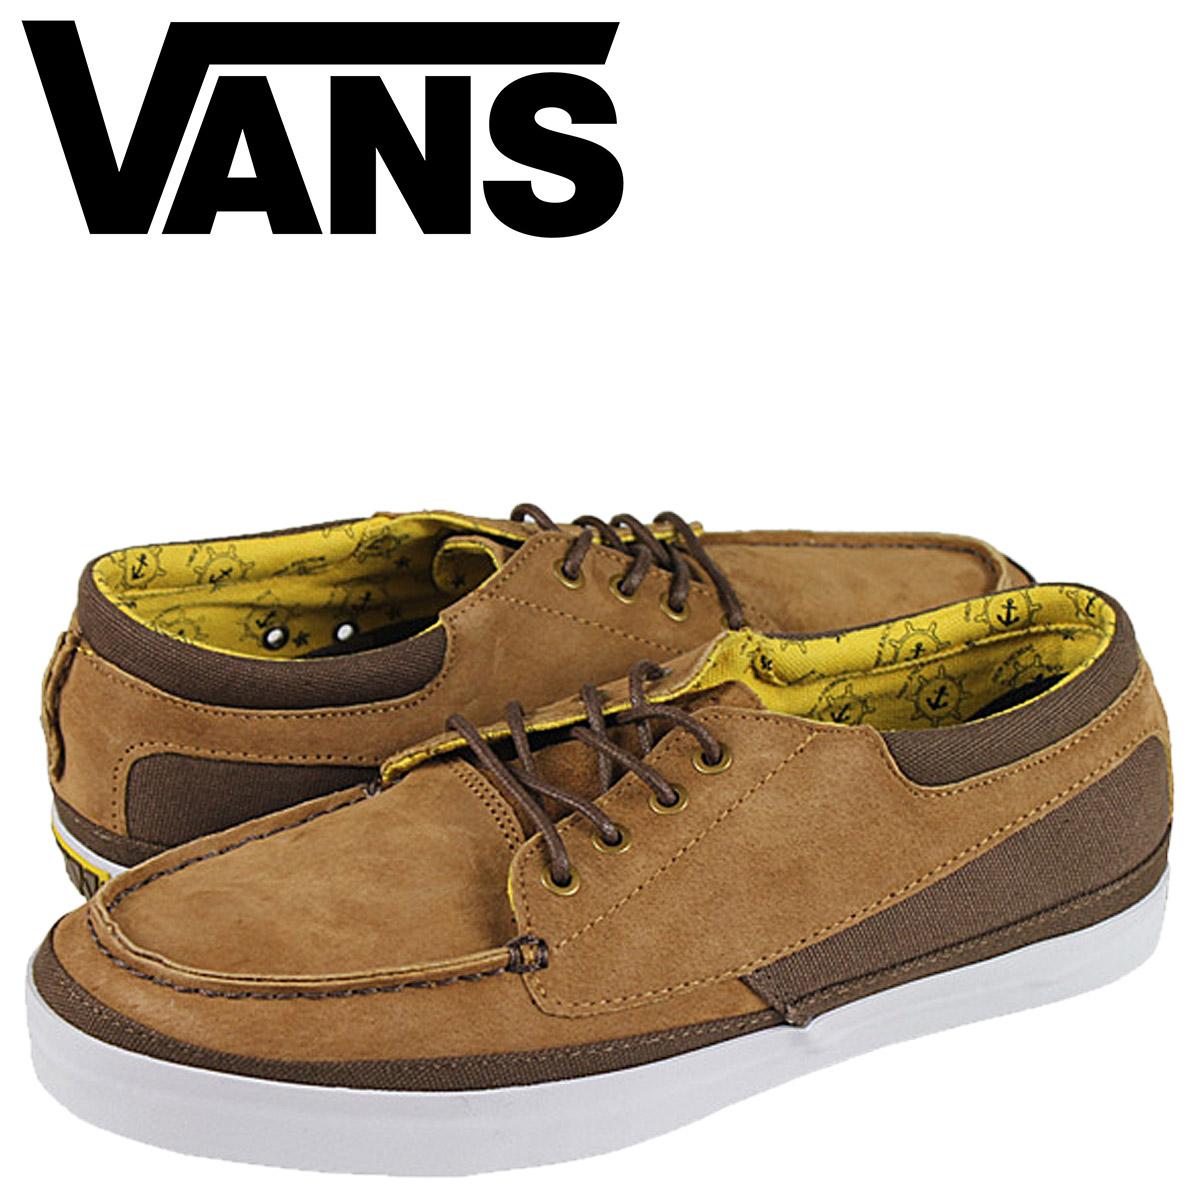 a741b15831 ALLSPORTS  VANS vans sneakers OTW COLLECTION COBERN VN-0NKE5MS men ...